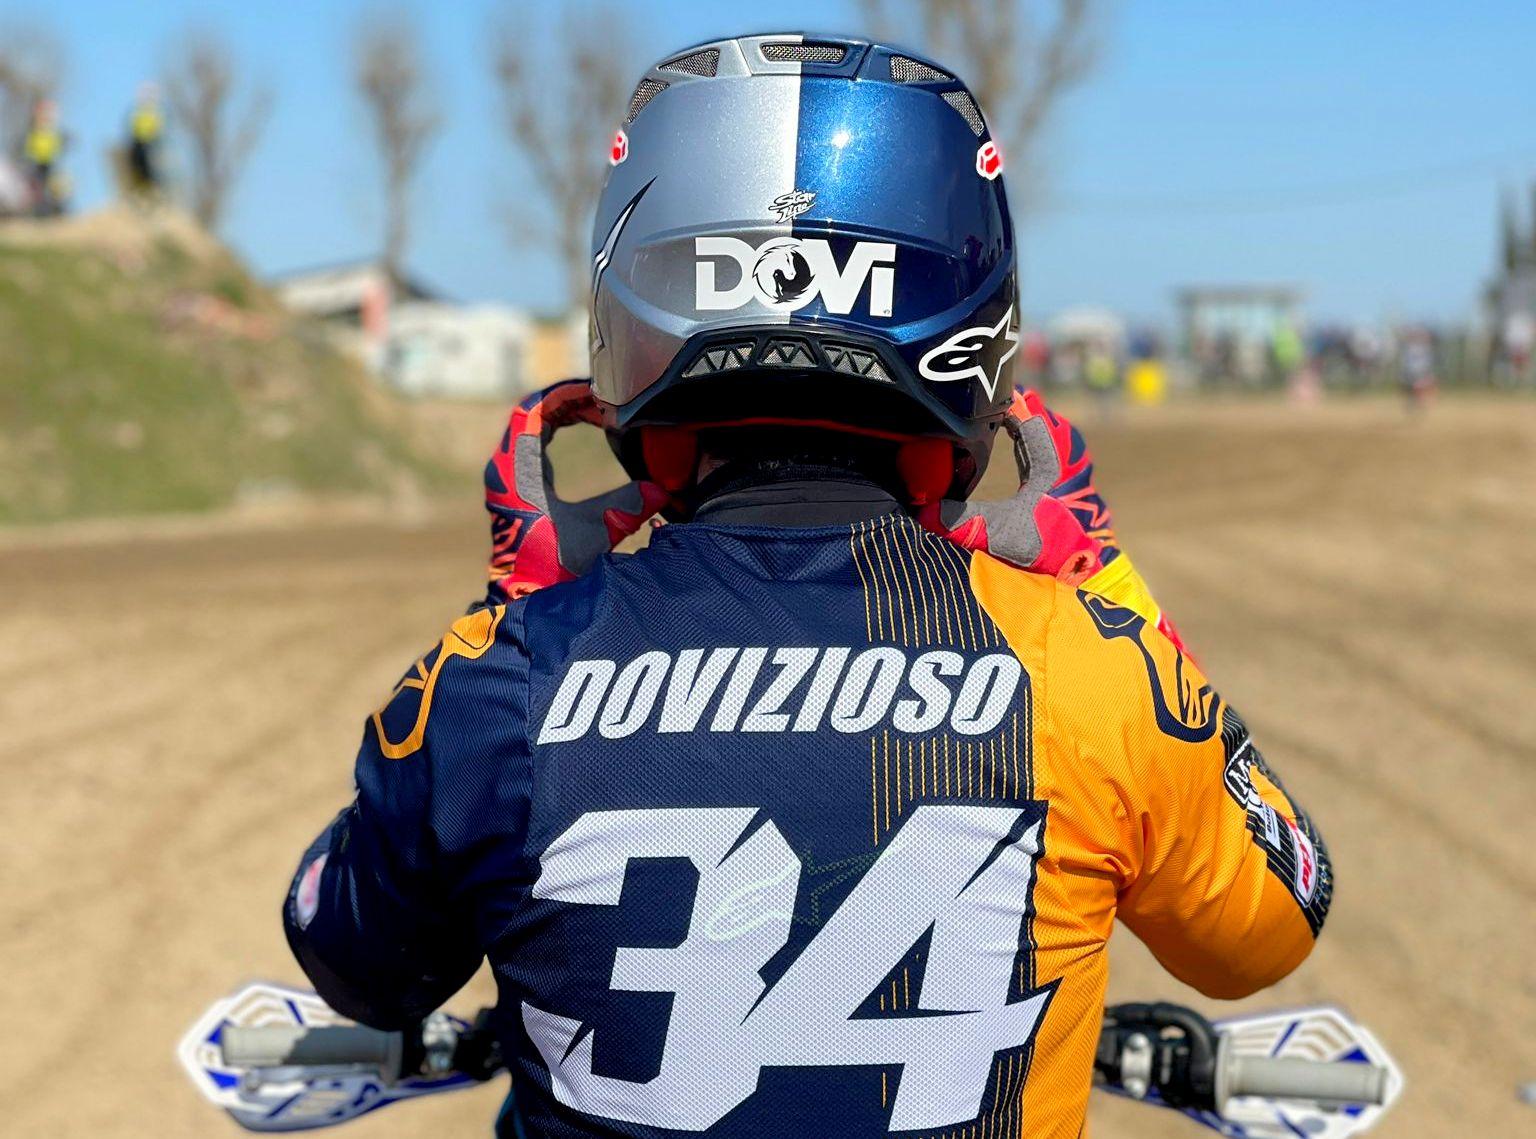 Dovizioso alami kecelakaan saat ikuti balapan Motocross